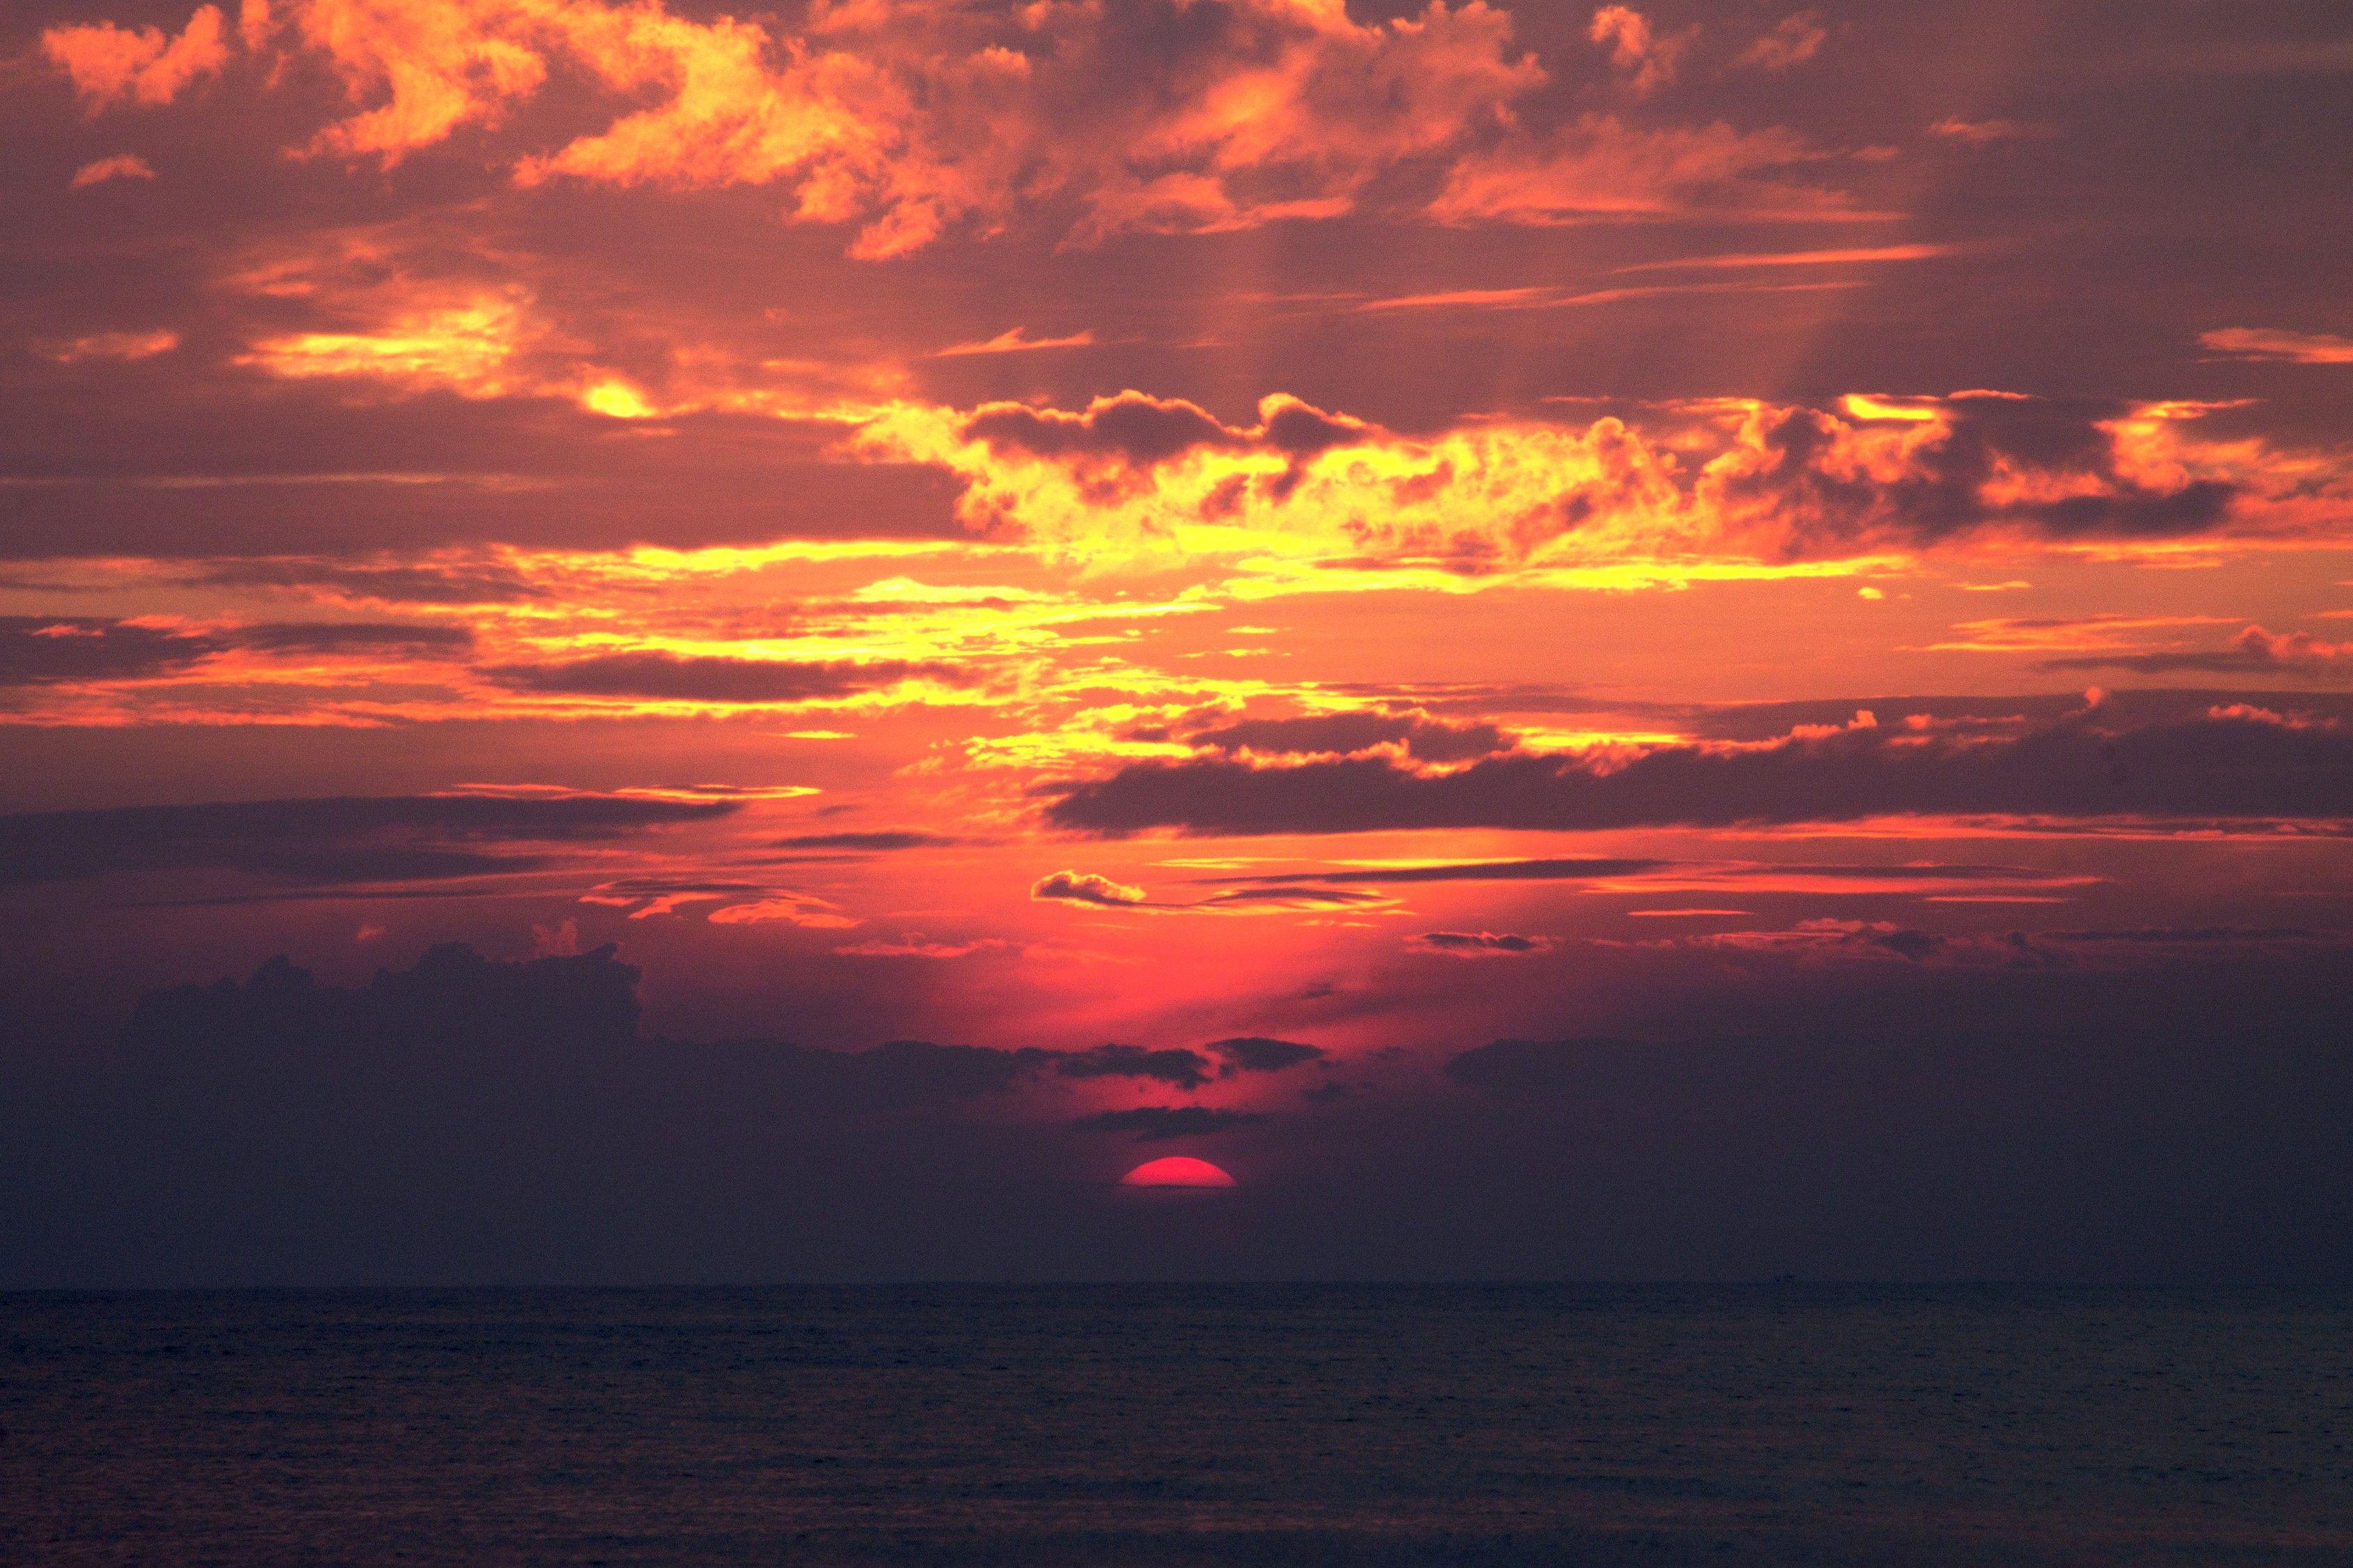 Sonnenuntergang wallpaper